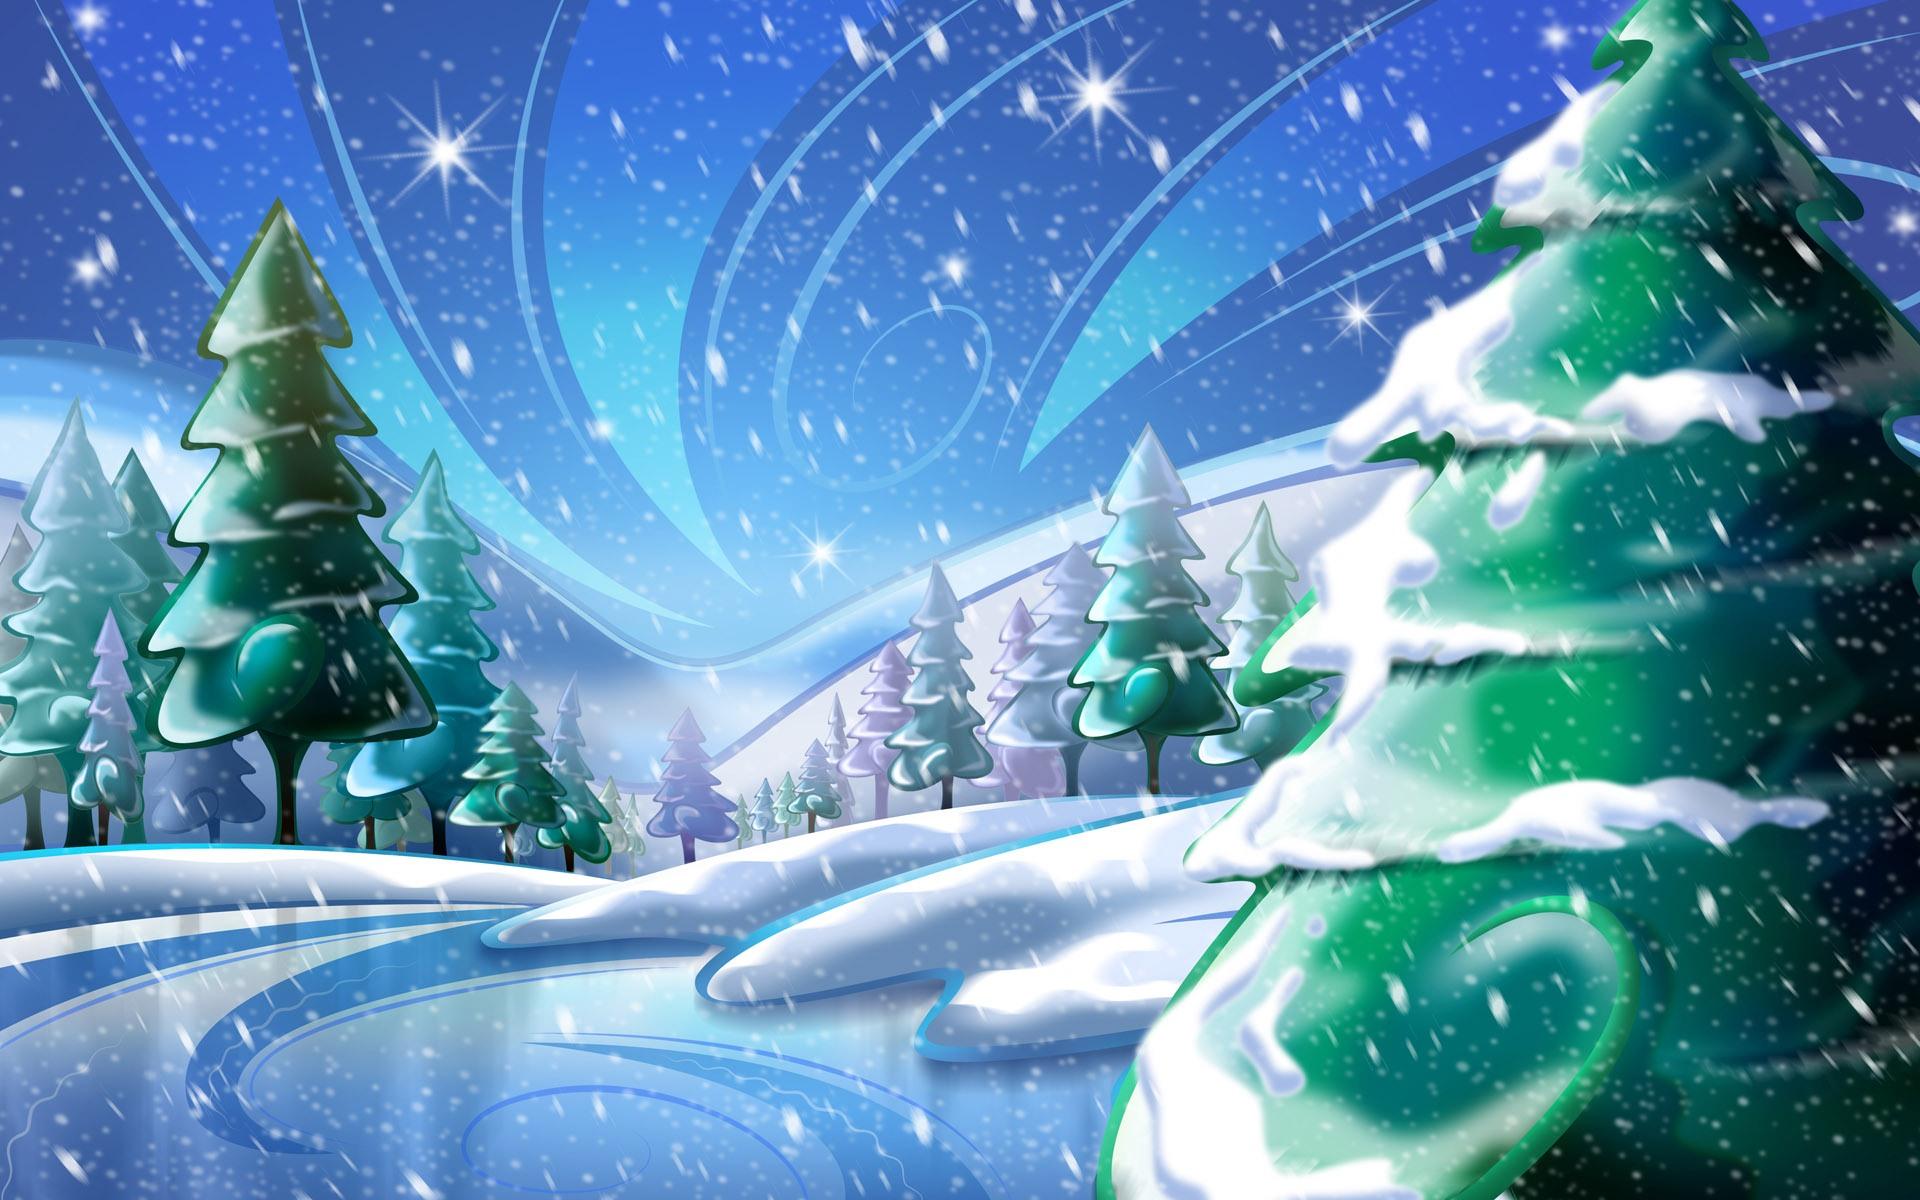 winter trees pine background wallpaper original 1920x1200 1920x1200